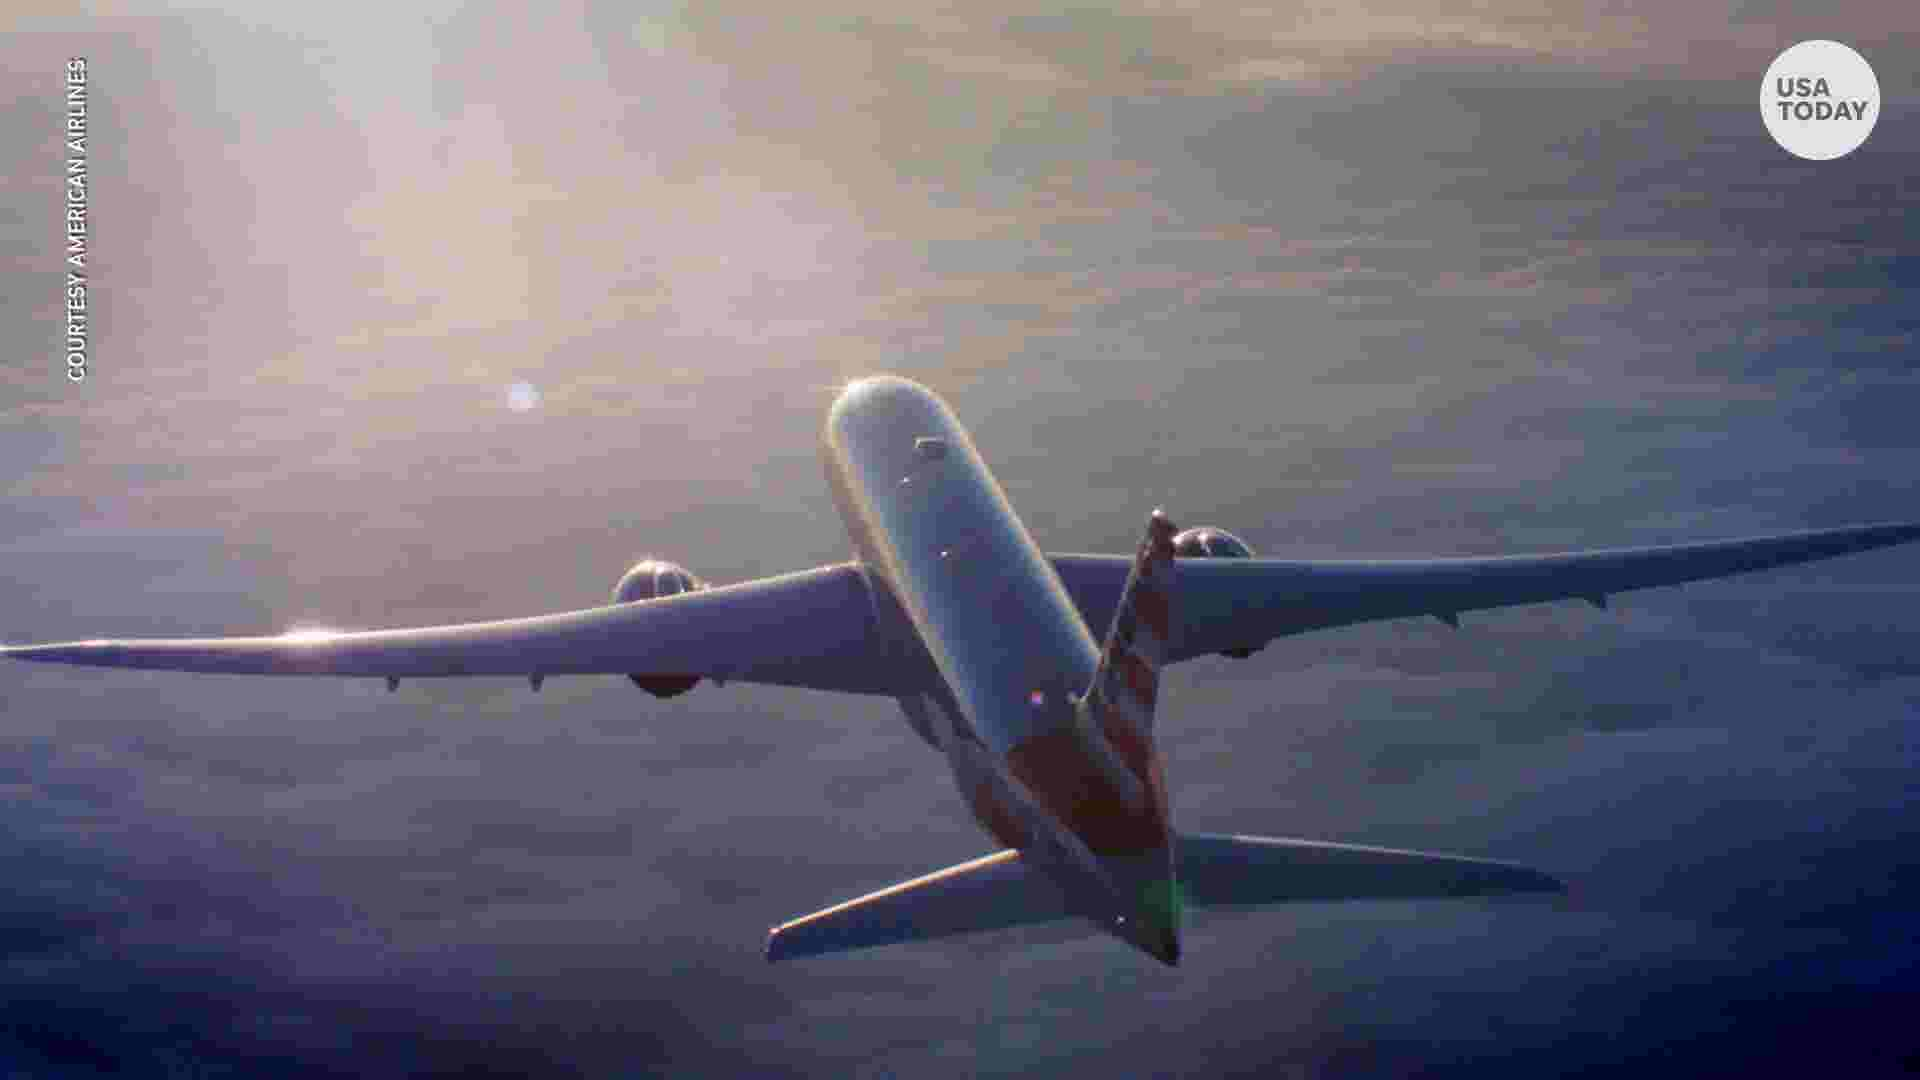 CDC investigates more sick people on planes